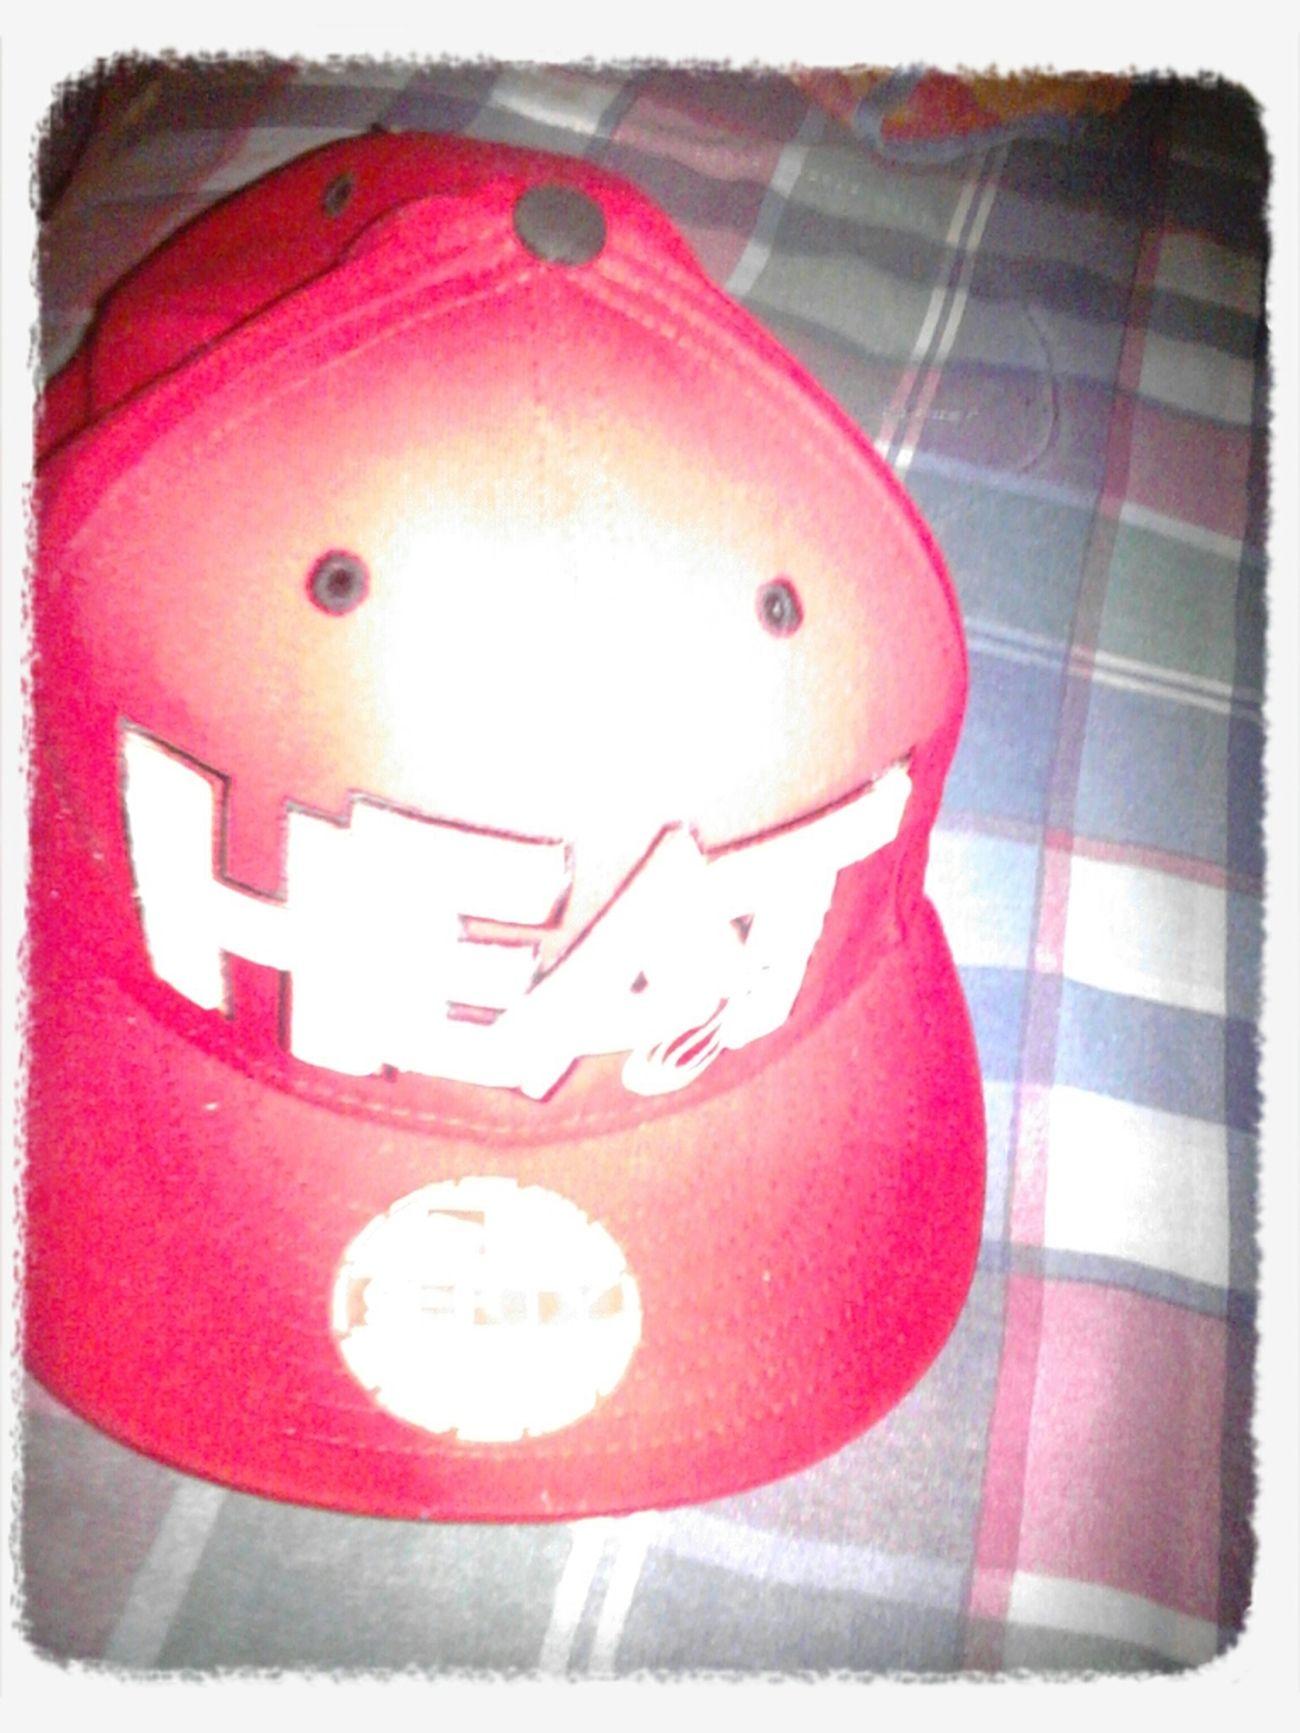 #Heat #SnapBack #Bored #SnappingPics #Like #Like4Like #FollowMe #Follow4Follow